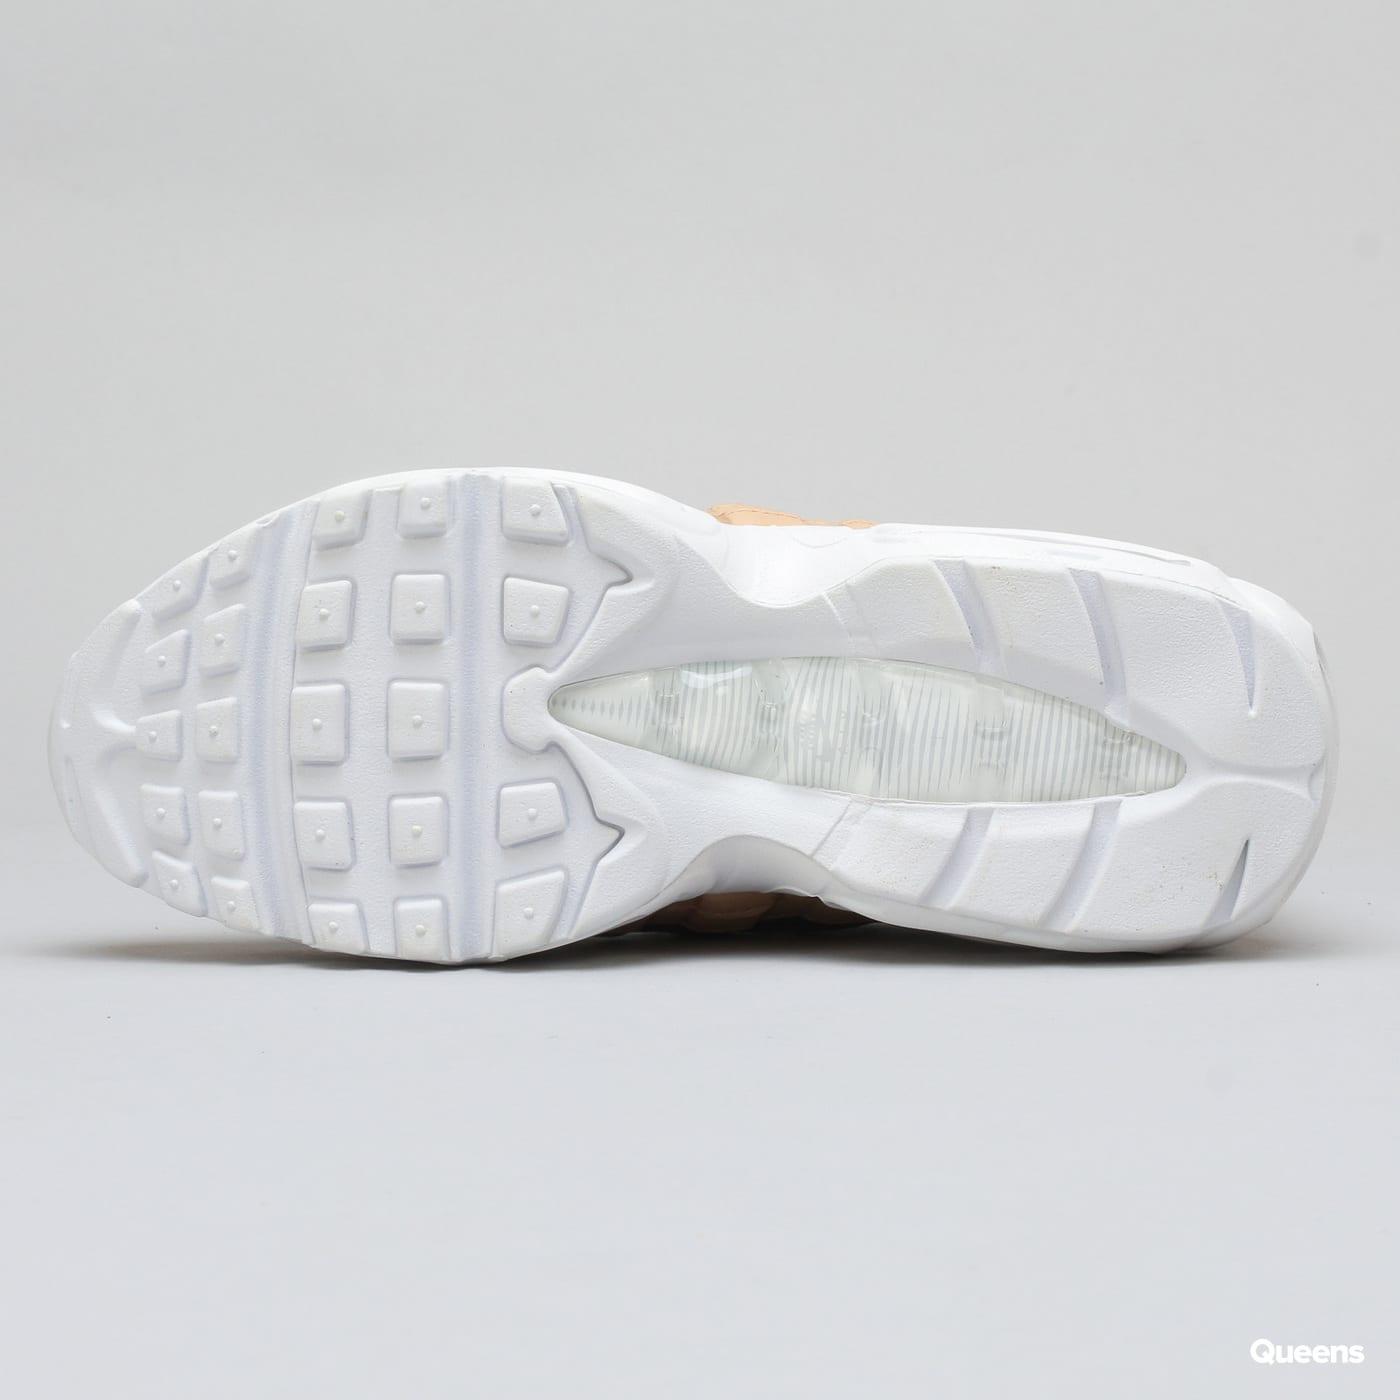 Nike WMNS Air Max 95 SE Premium pure platinum / metallic silver